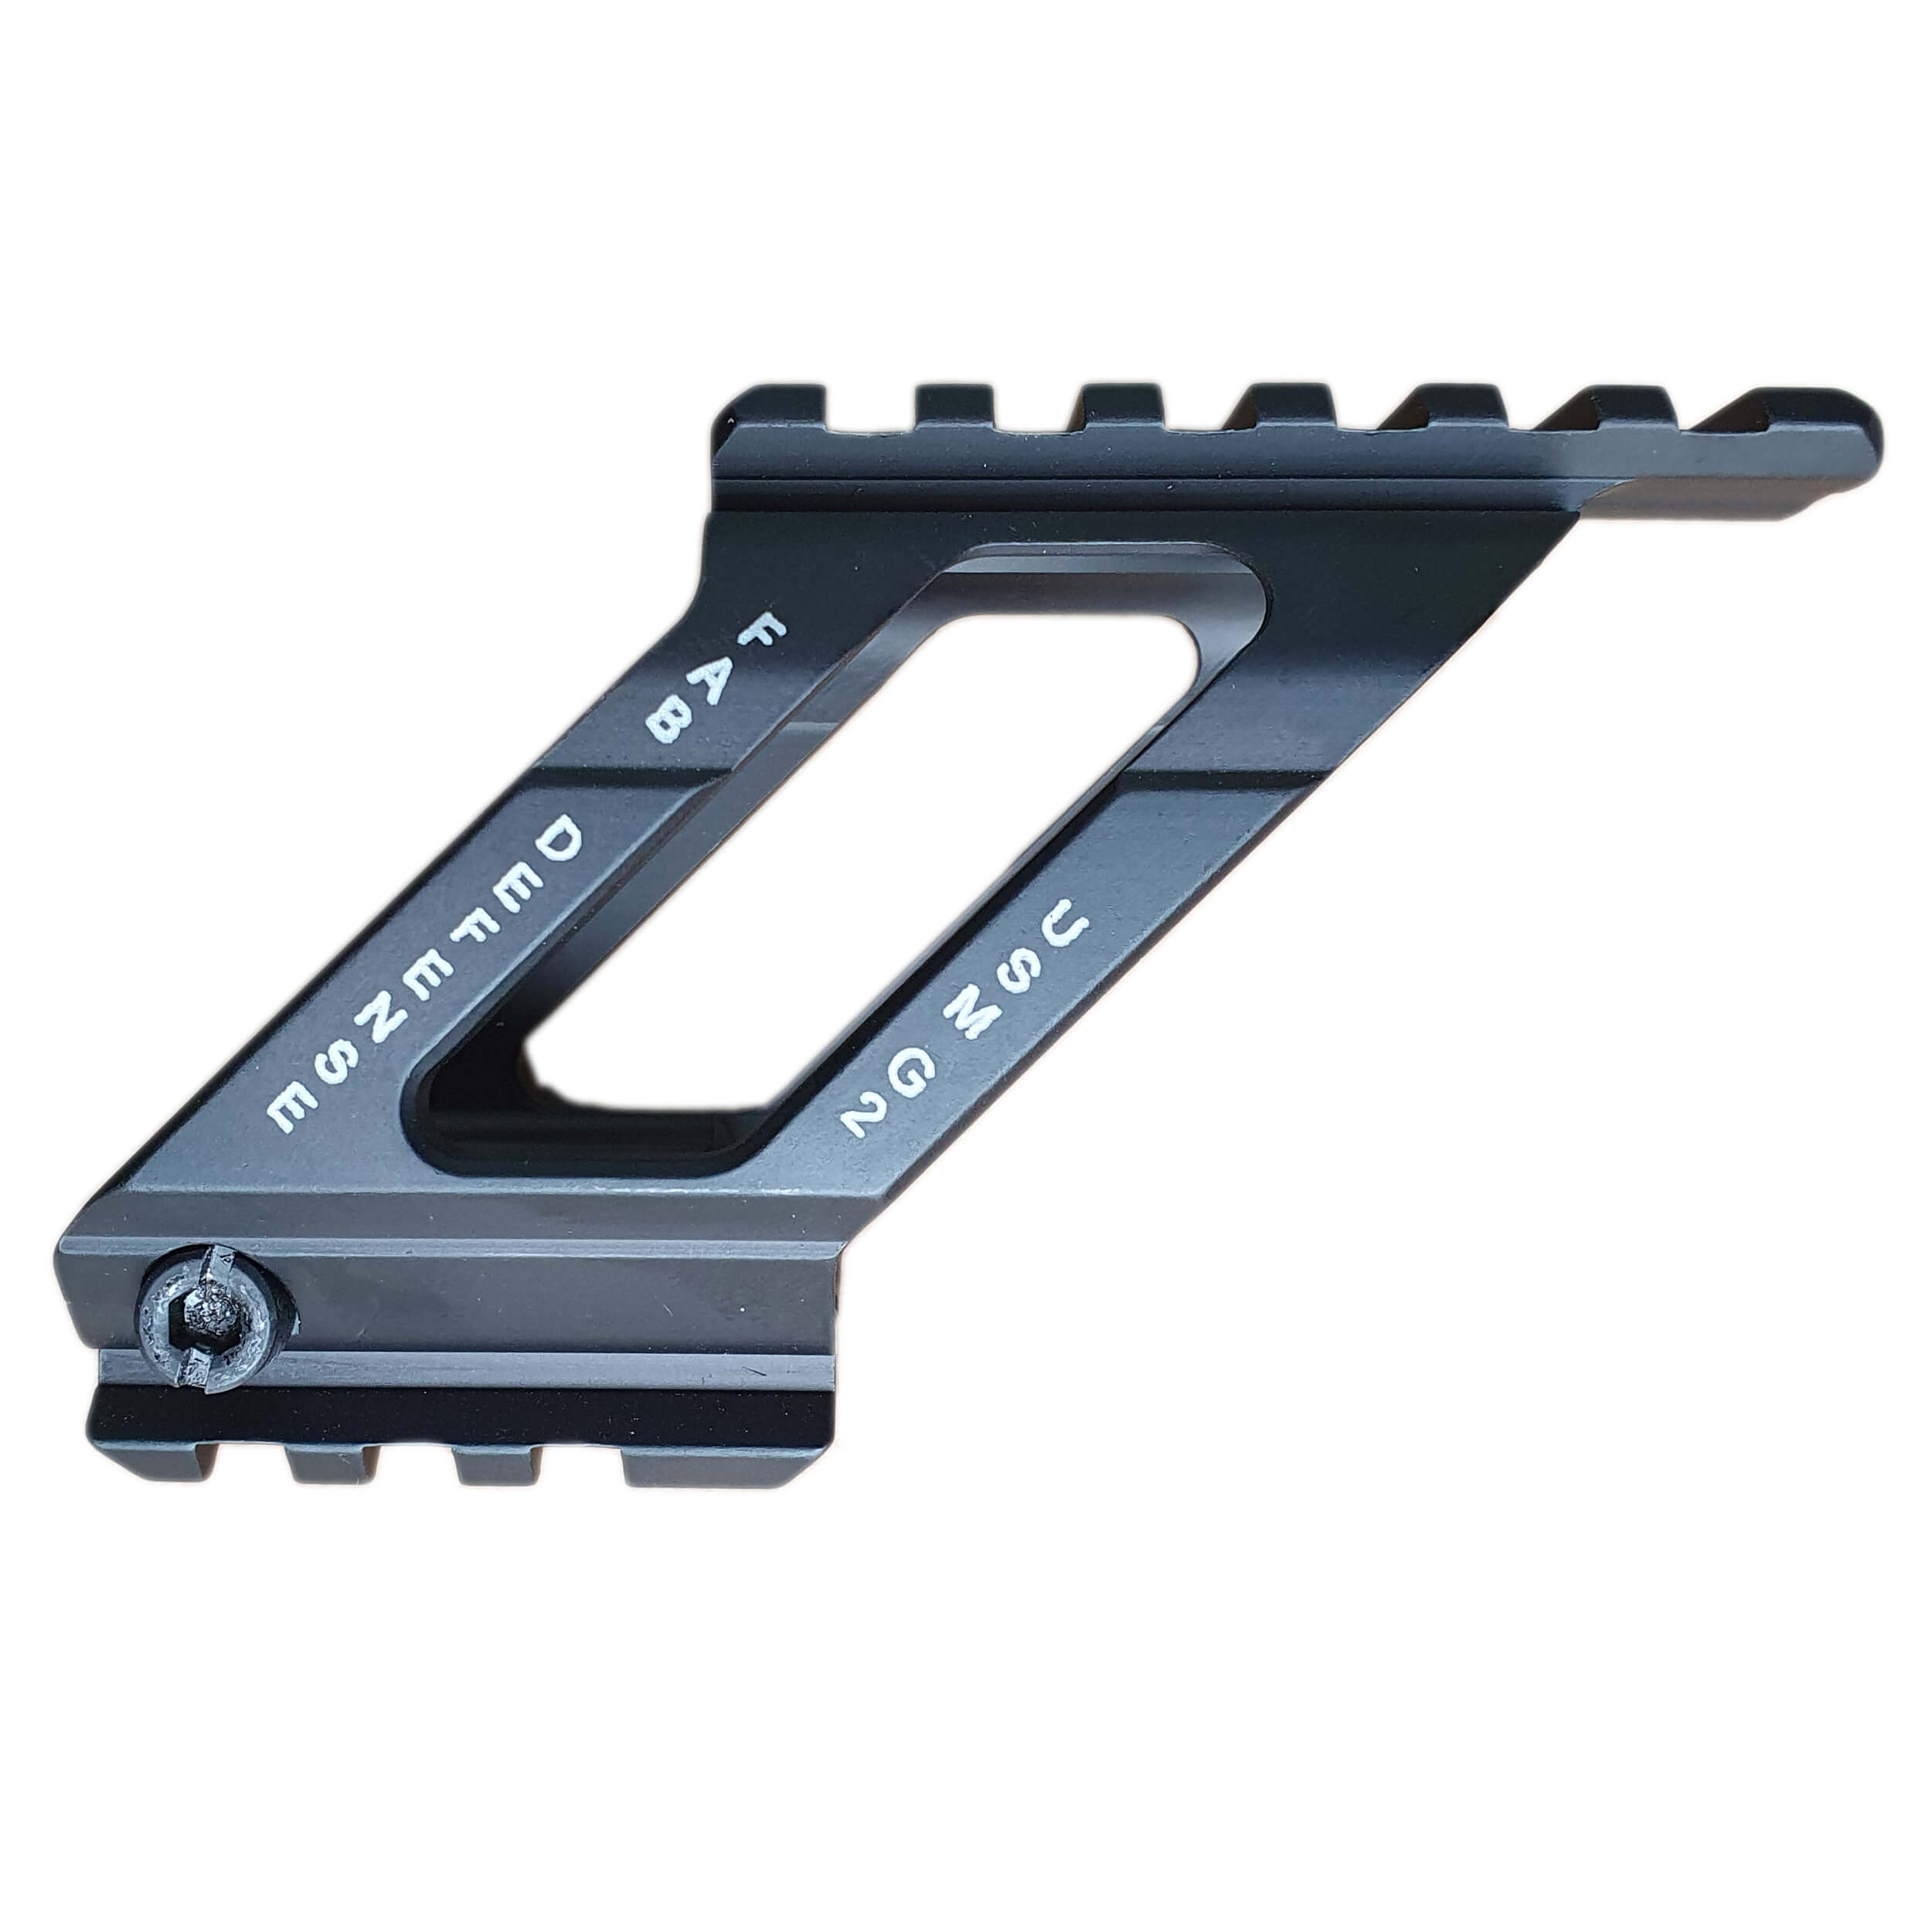 Universal Handgun Scope Mount  - USM